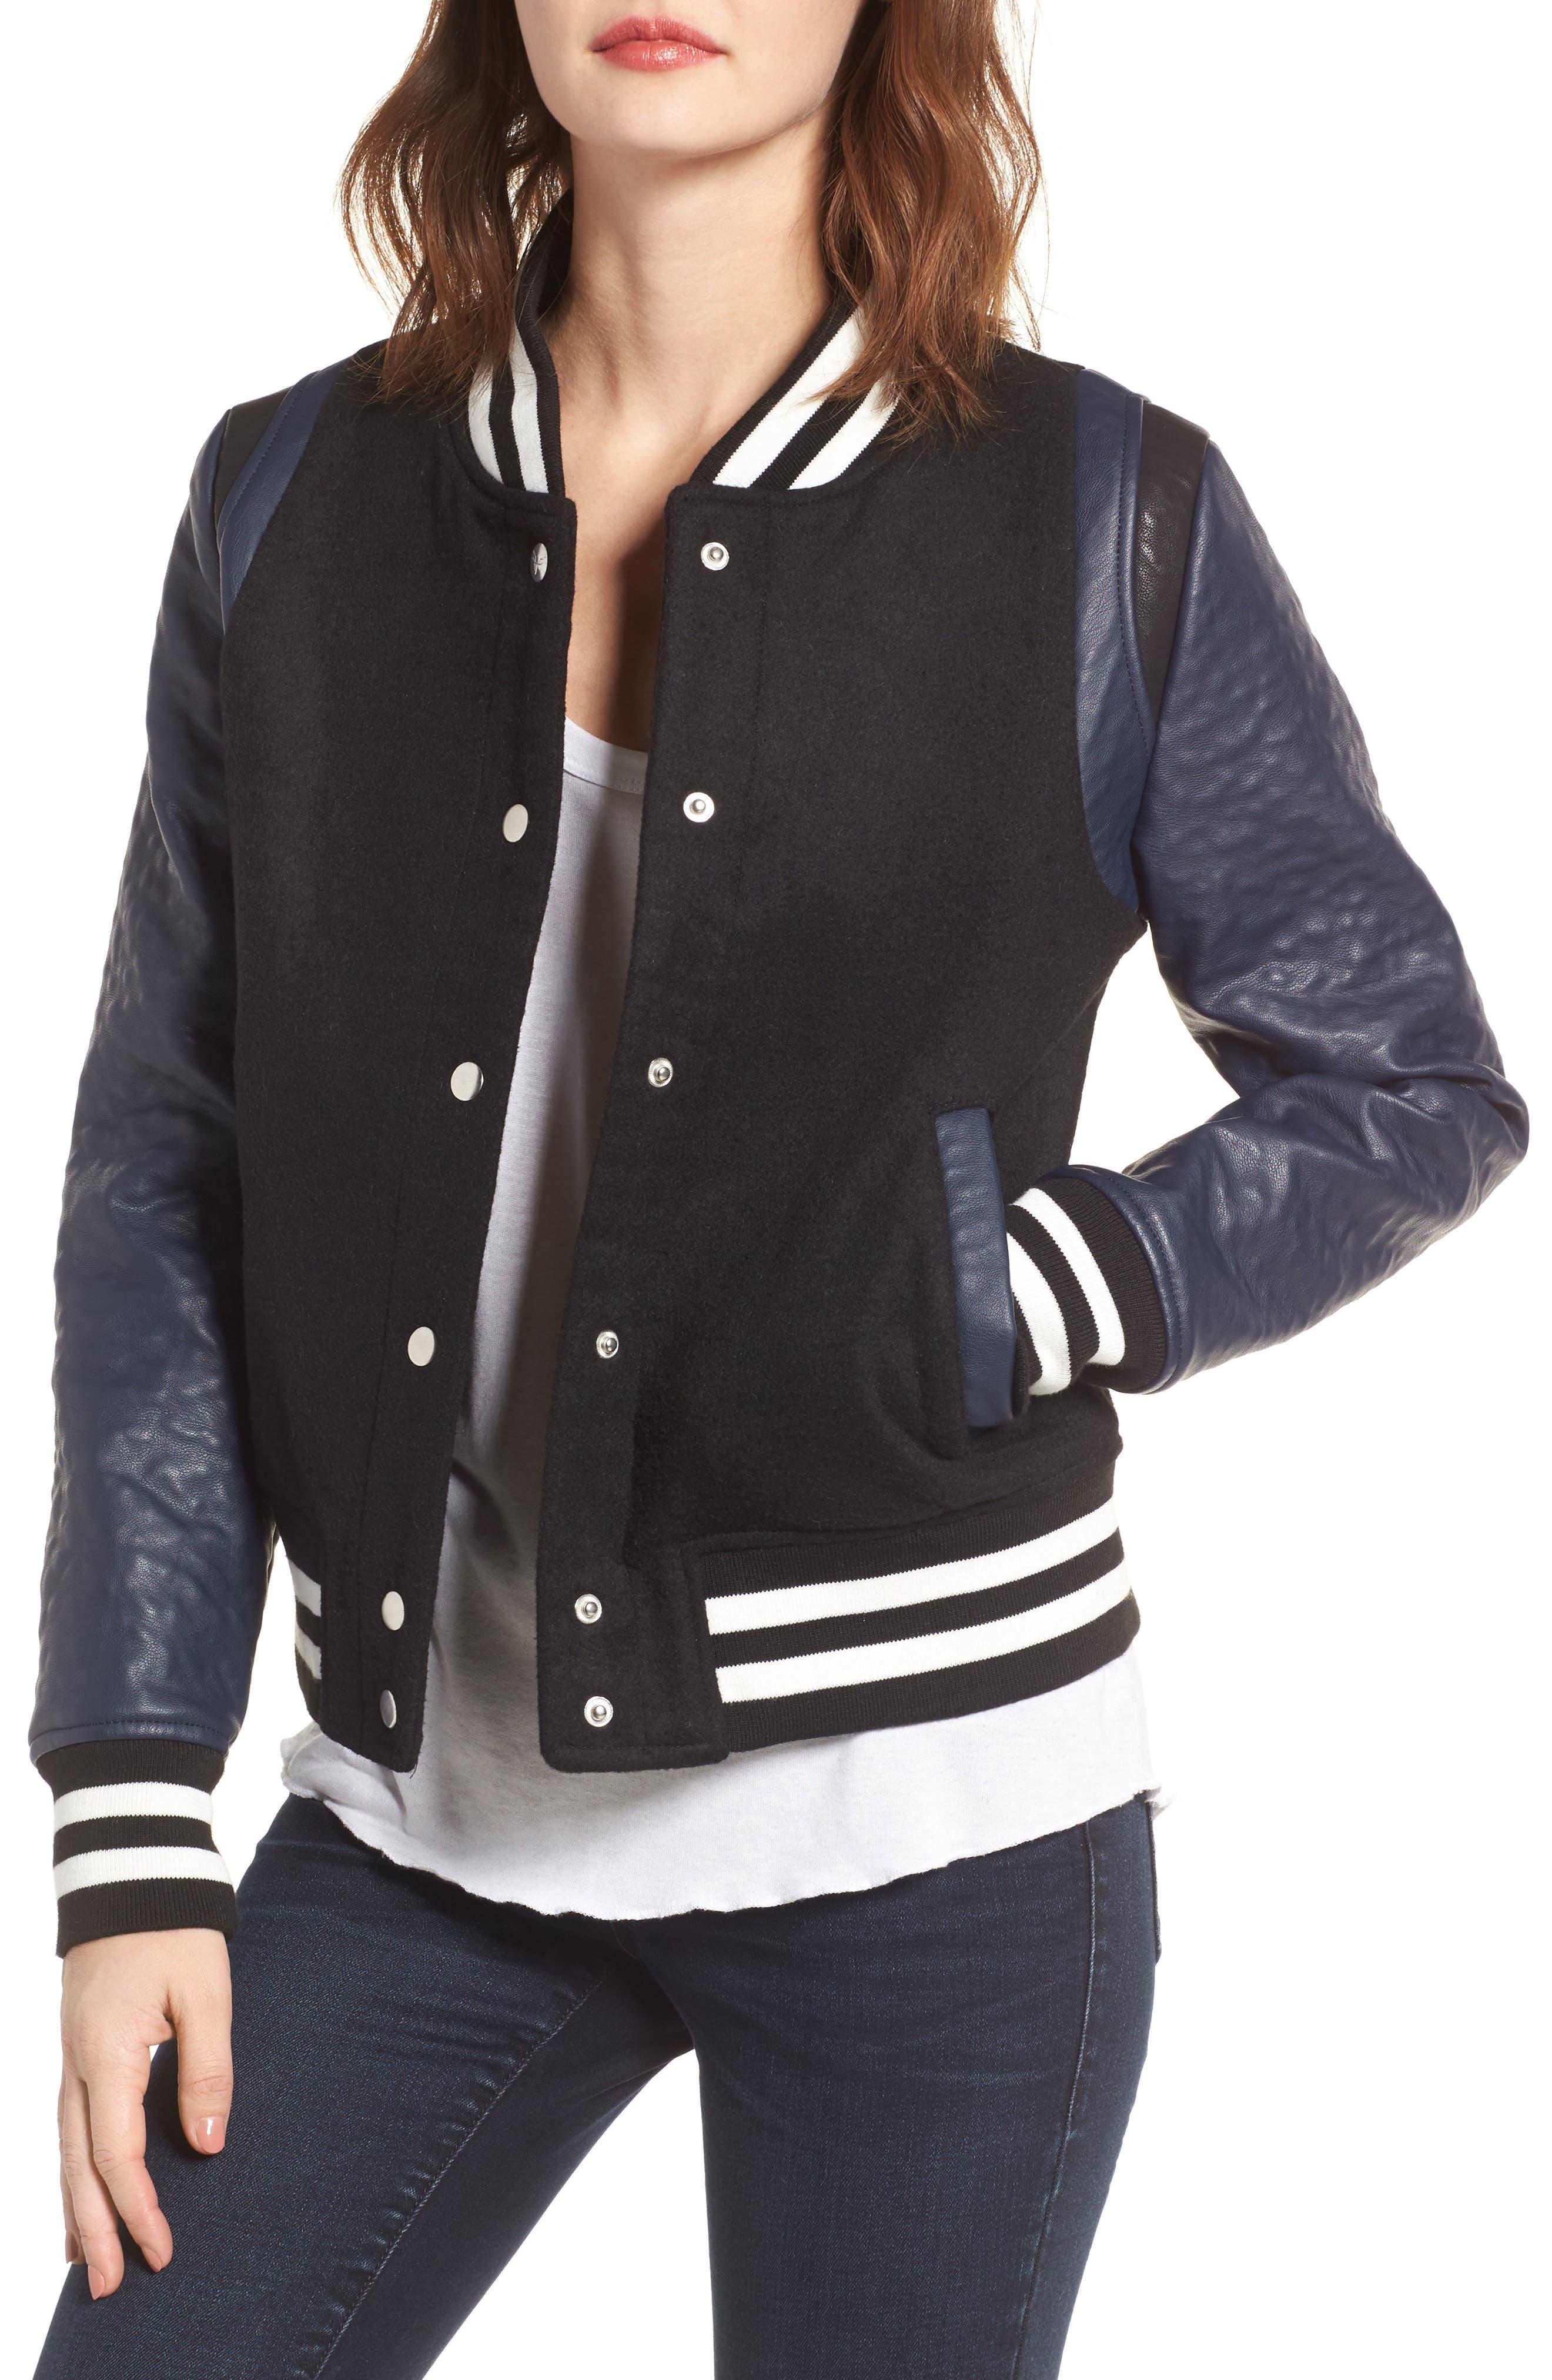 Alternate Image 1 Selected - Vigoss Wool & Faux Leather Baseball Jacket